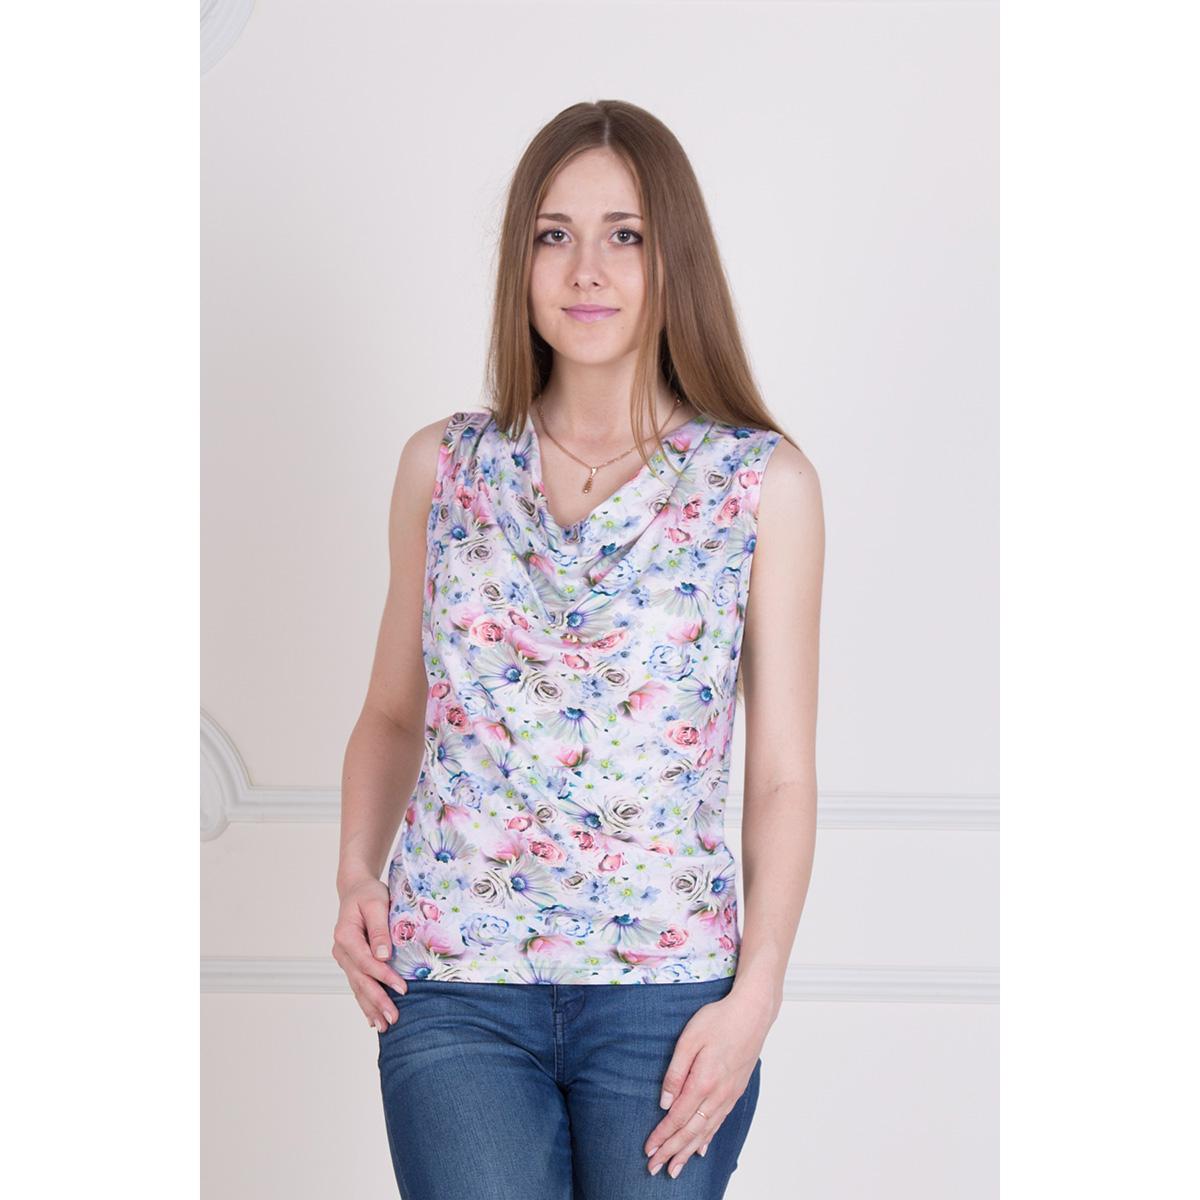 Женская блуза Элиза арт. 0335, размер 42Блузы<br>Обхват груди:84 см<br>Обхват талии:65 см<br>Обхват бедер:92 см<br>Рост:167 см<br><br>Тип: Жен. блуза<br>Размер: 42<br>Материал: Вискоза